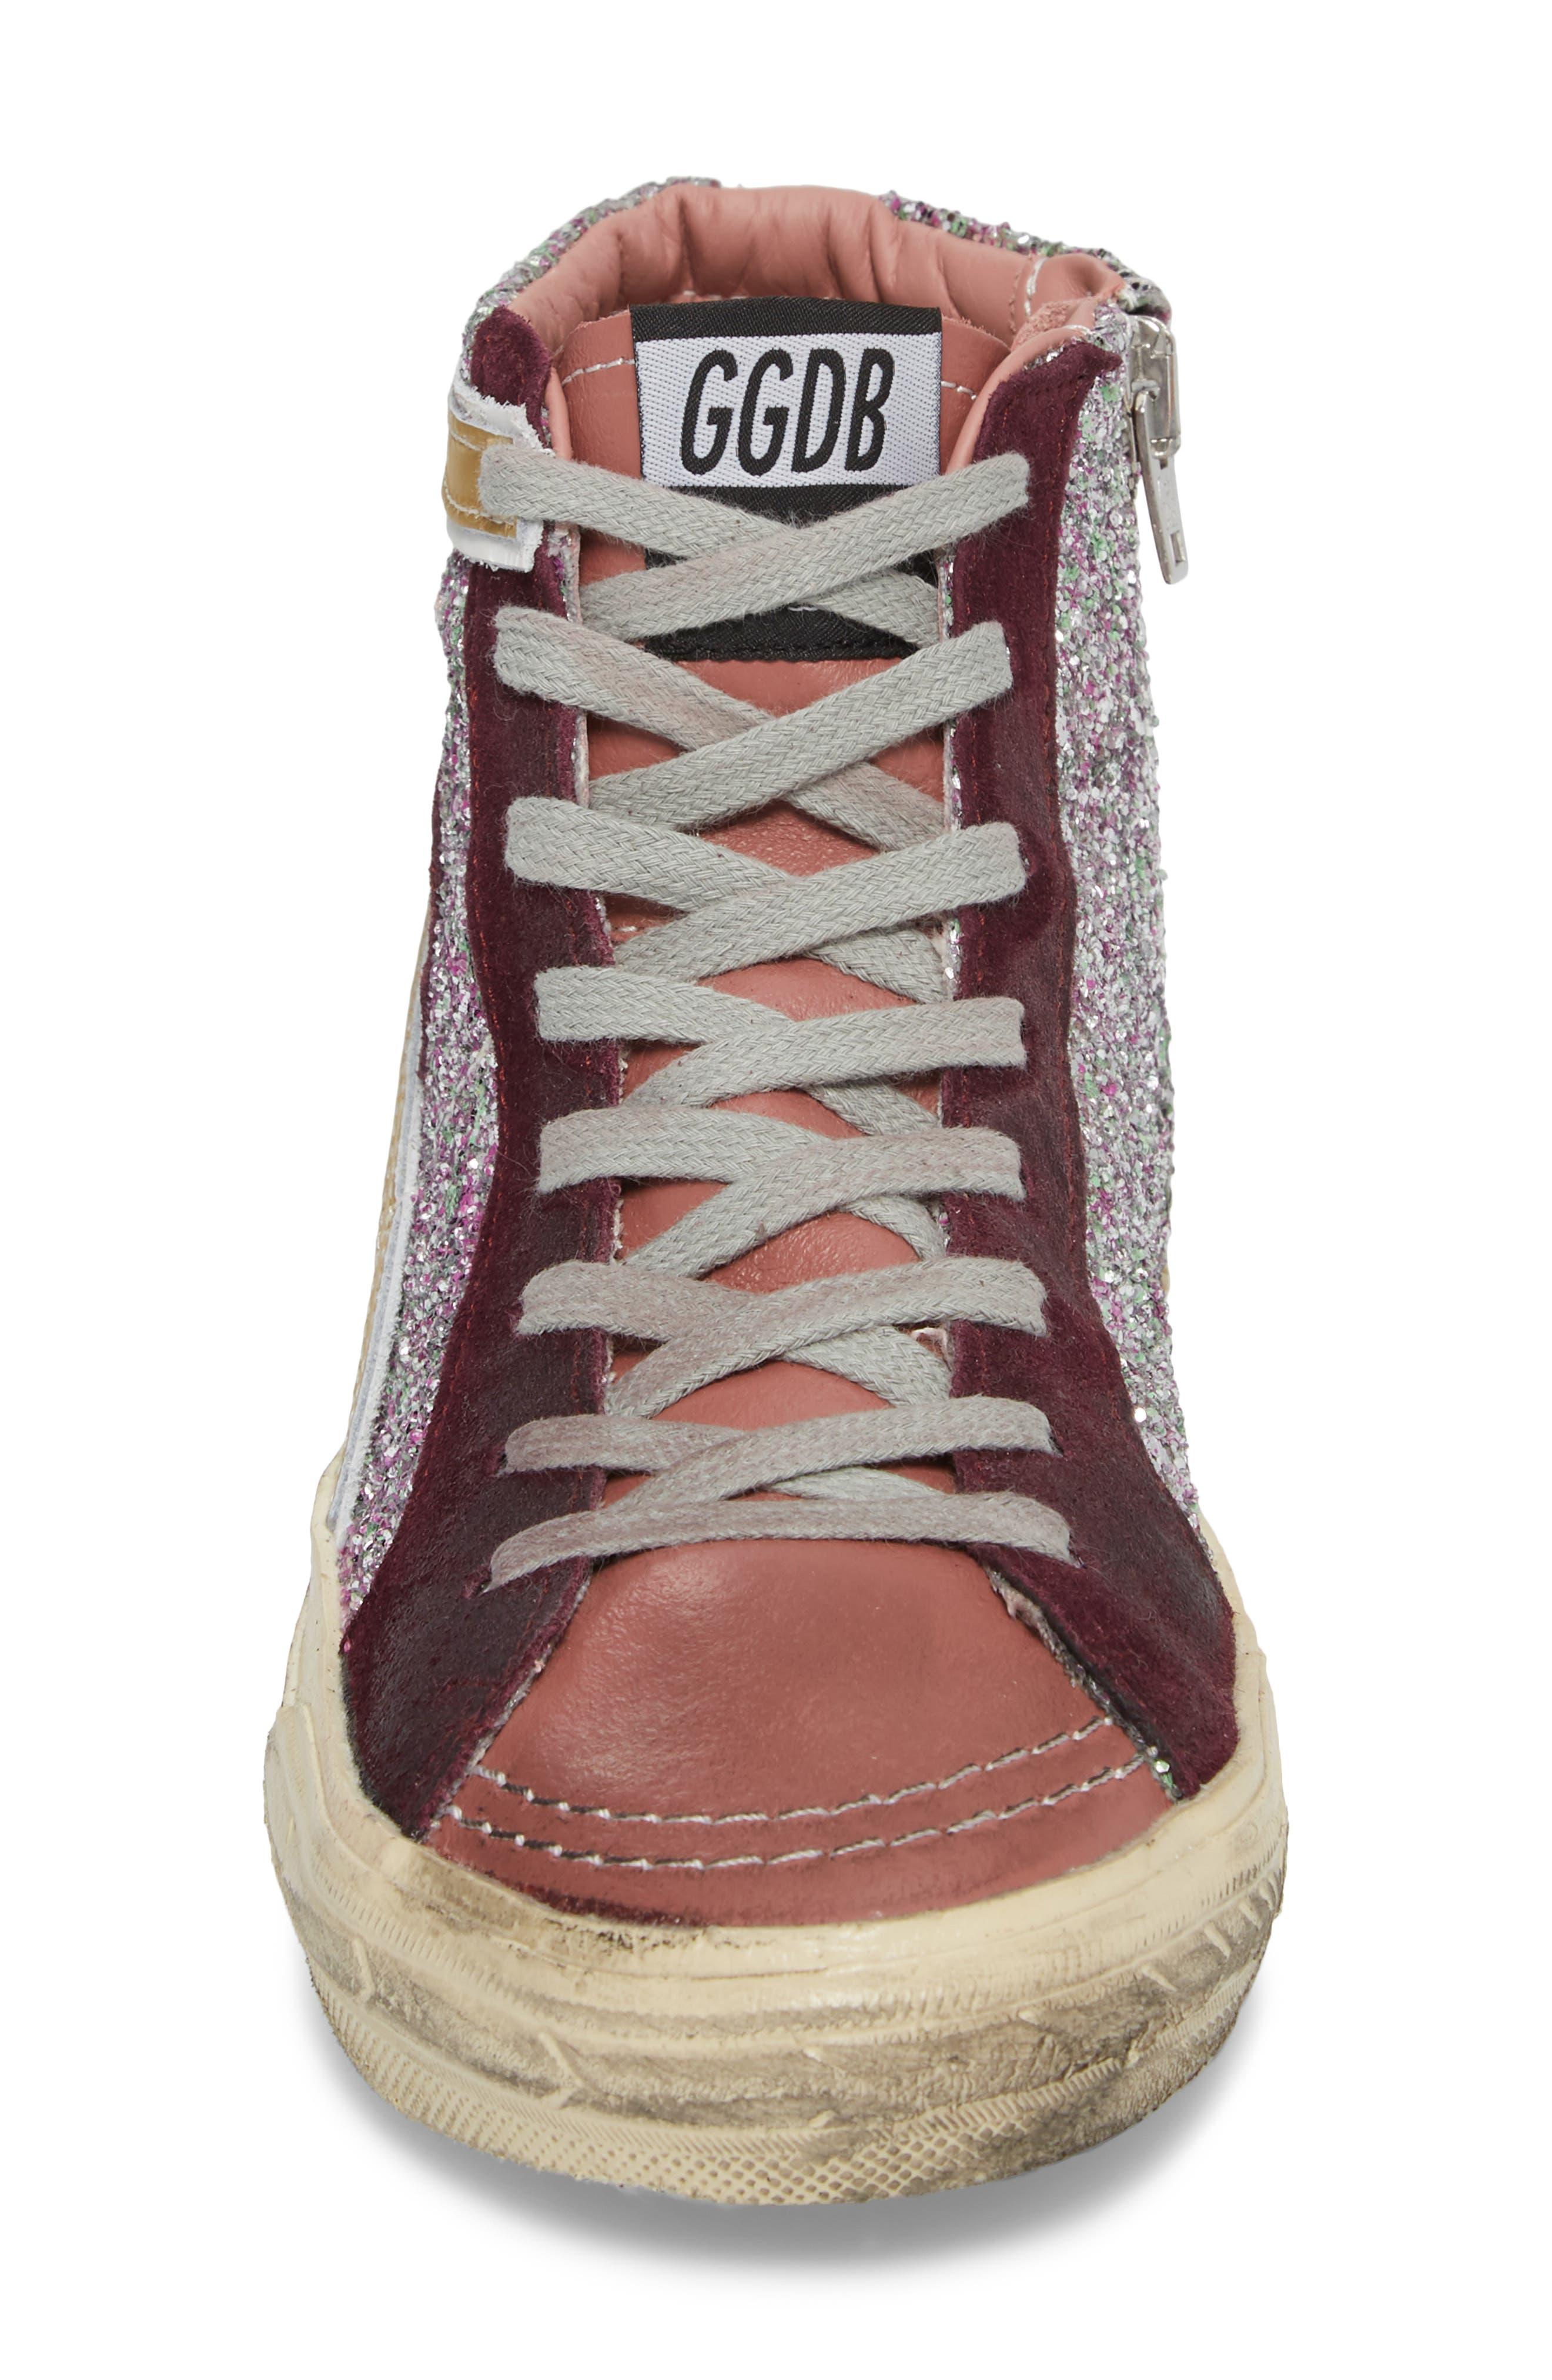 Slide High Top Sneaker,                             Alternate thumbnail 4, color,                             Bordeaux / Pink/ Gold